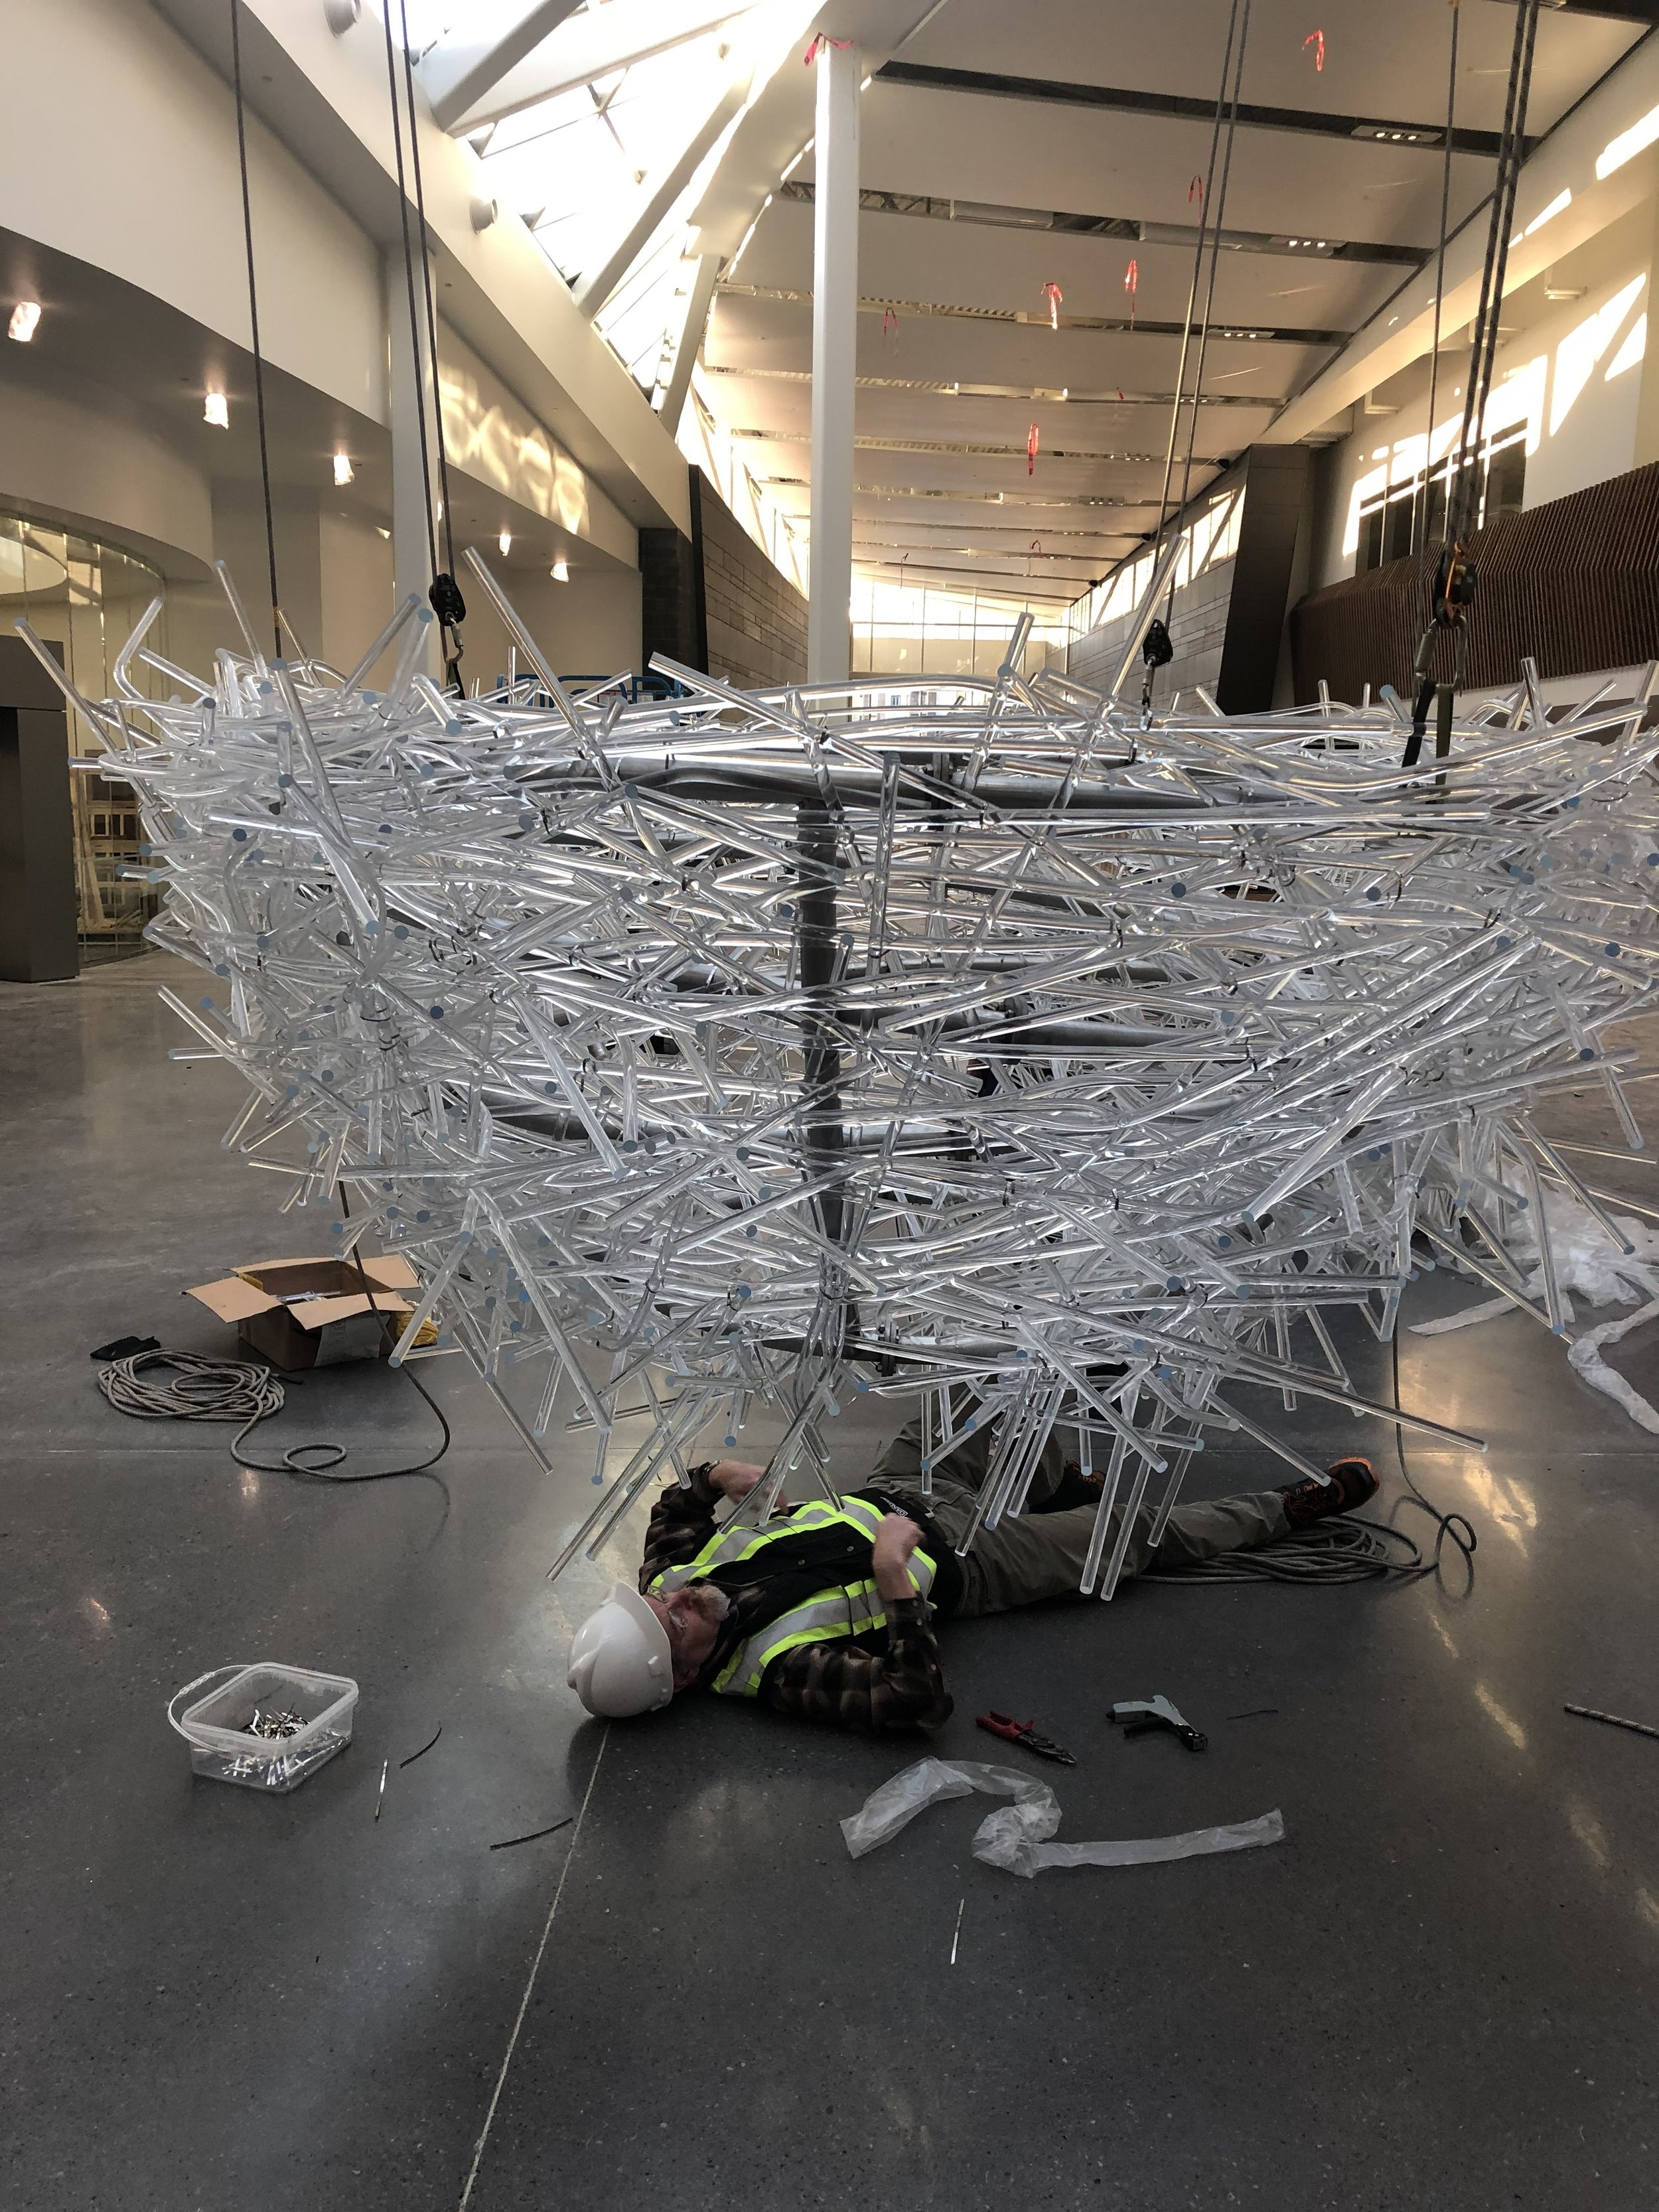 Calgary_The Nest_Donald Lipski_Public Art Services_J Grant Projects_25.jpg